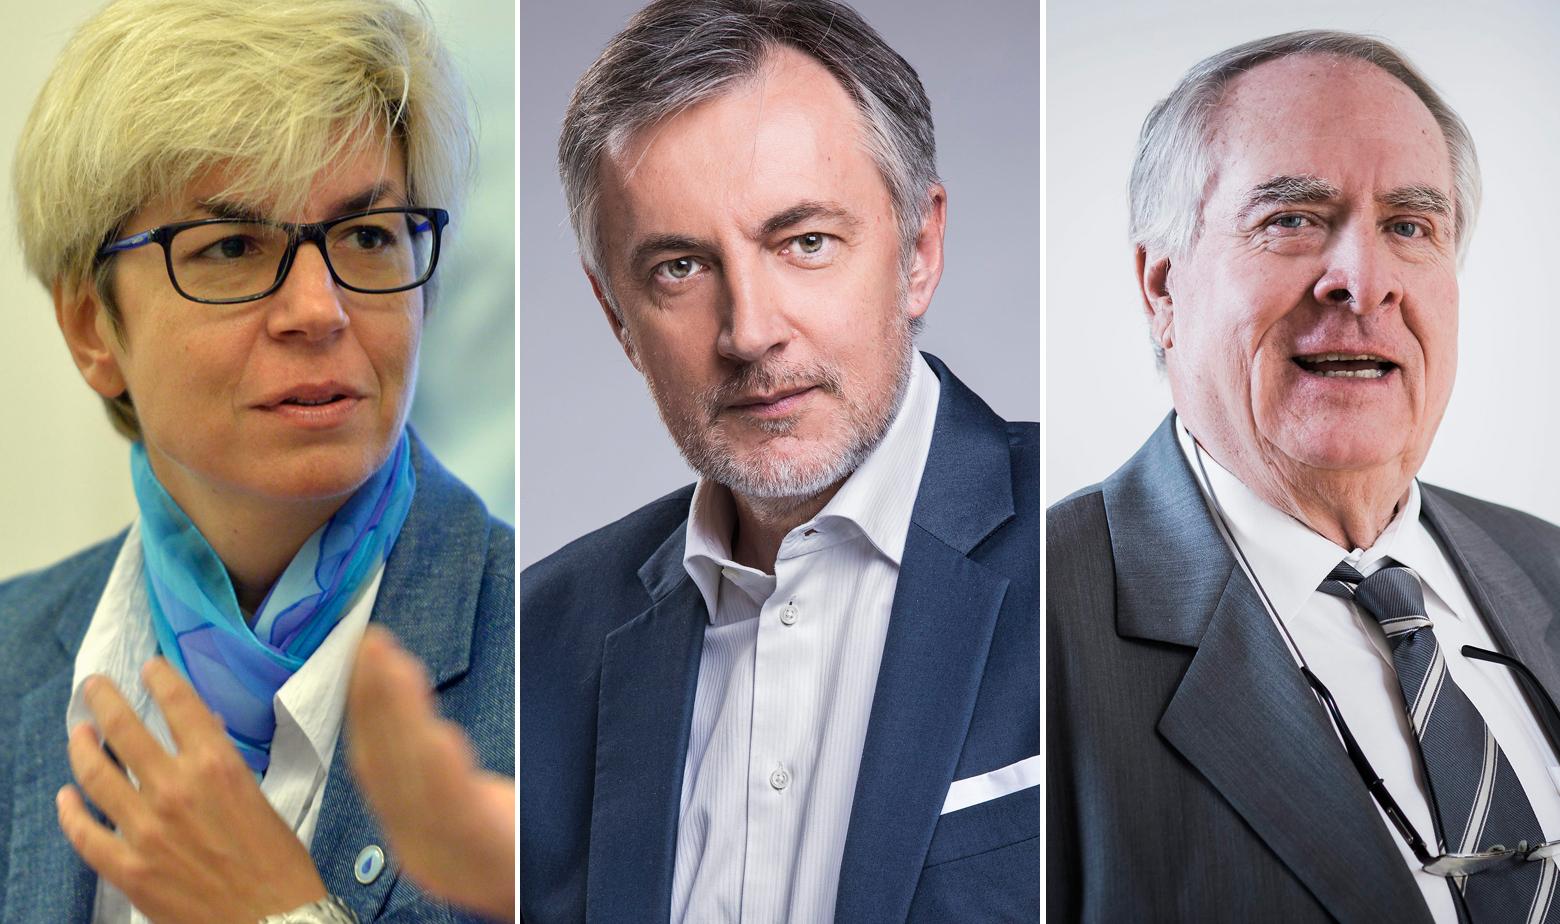 Sanja Barić, Miroslav Škoro, Branko Smerdel